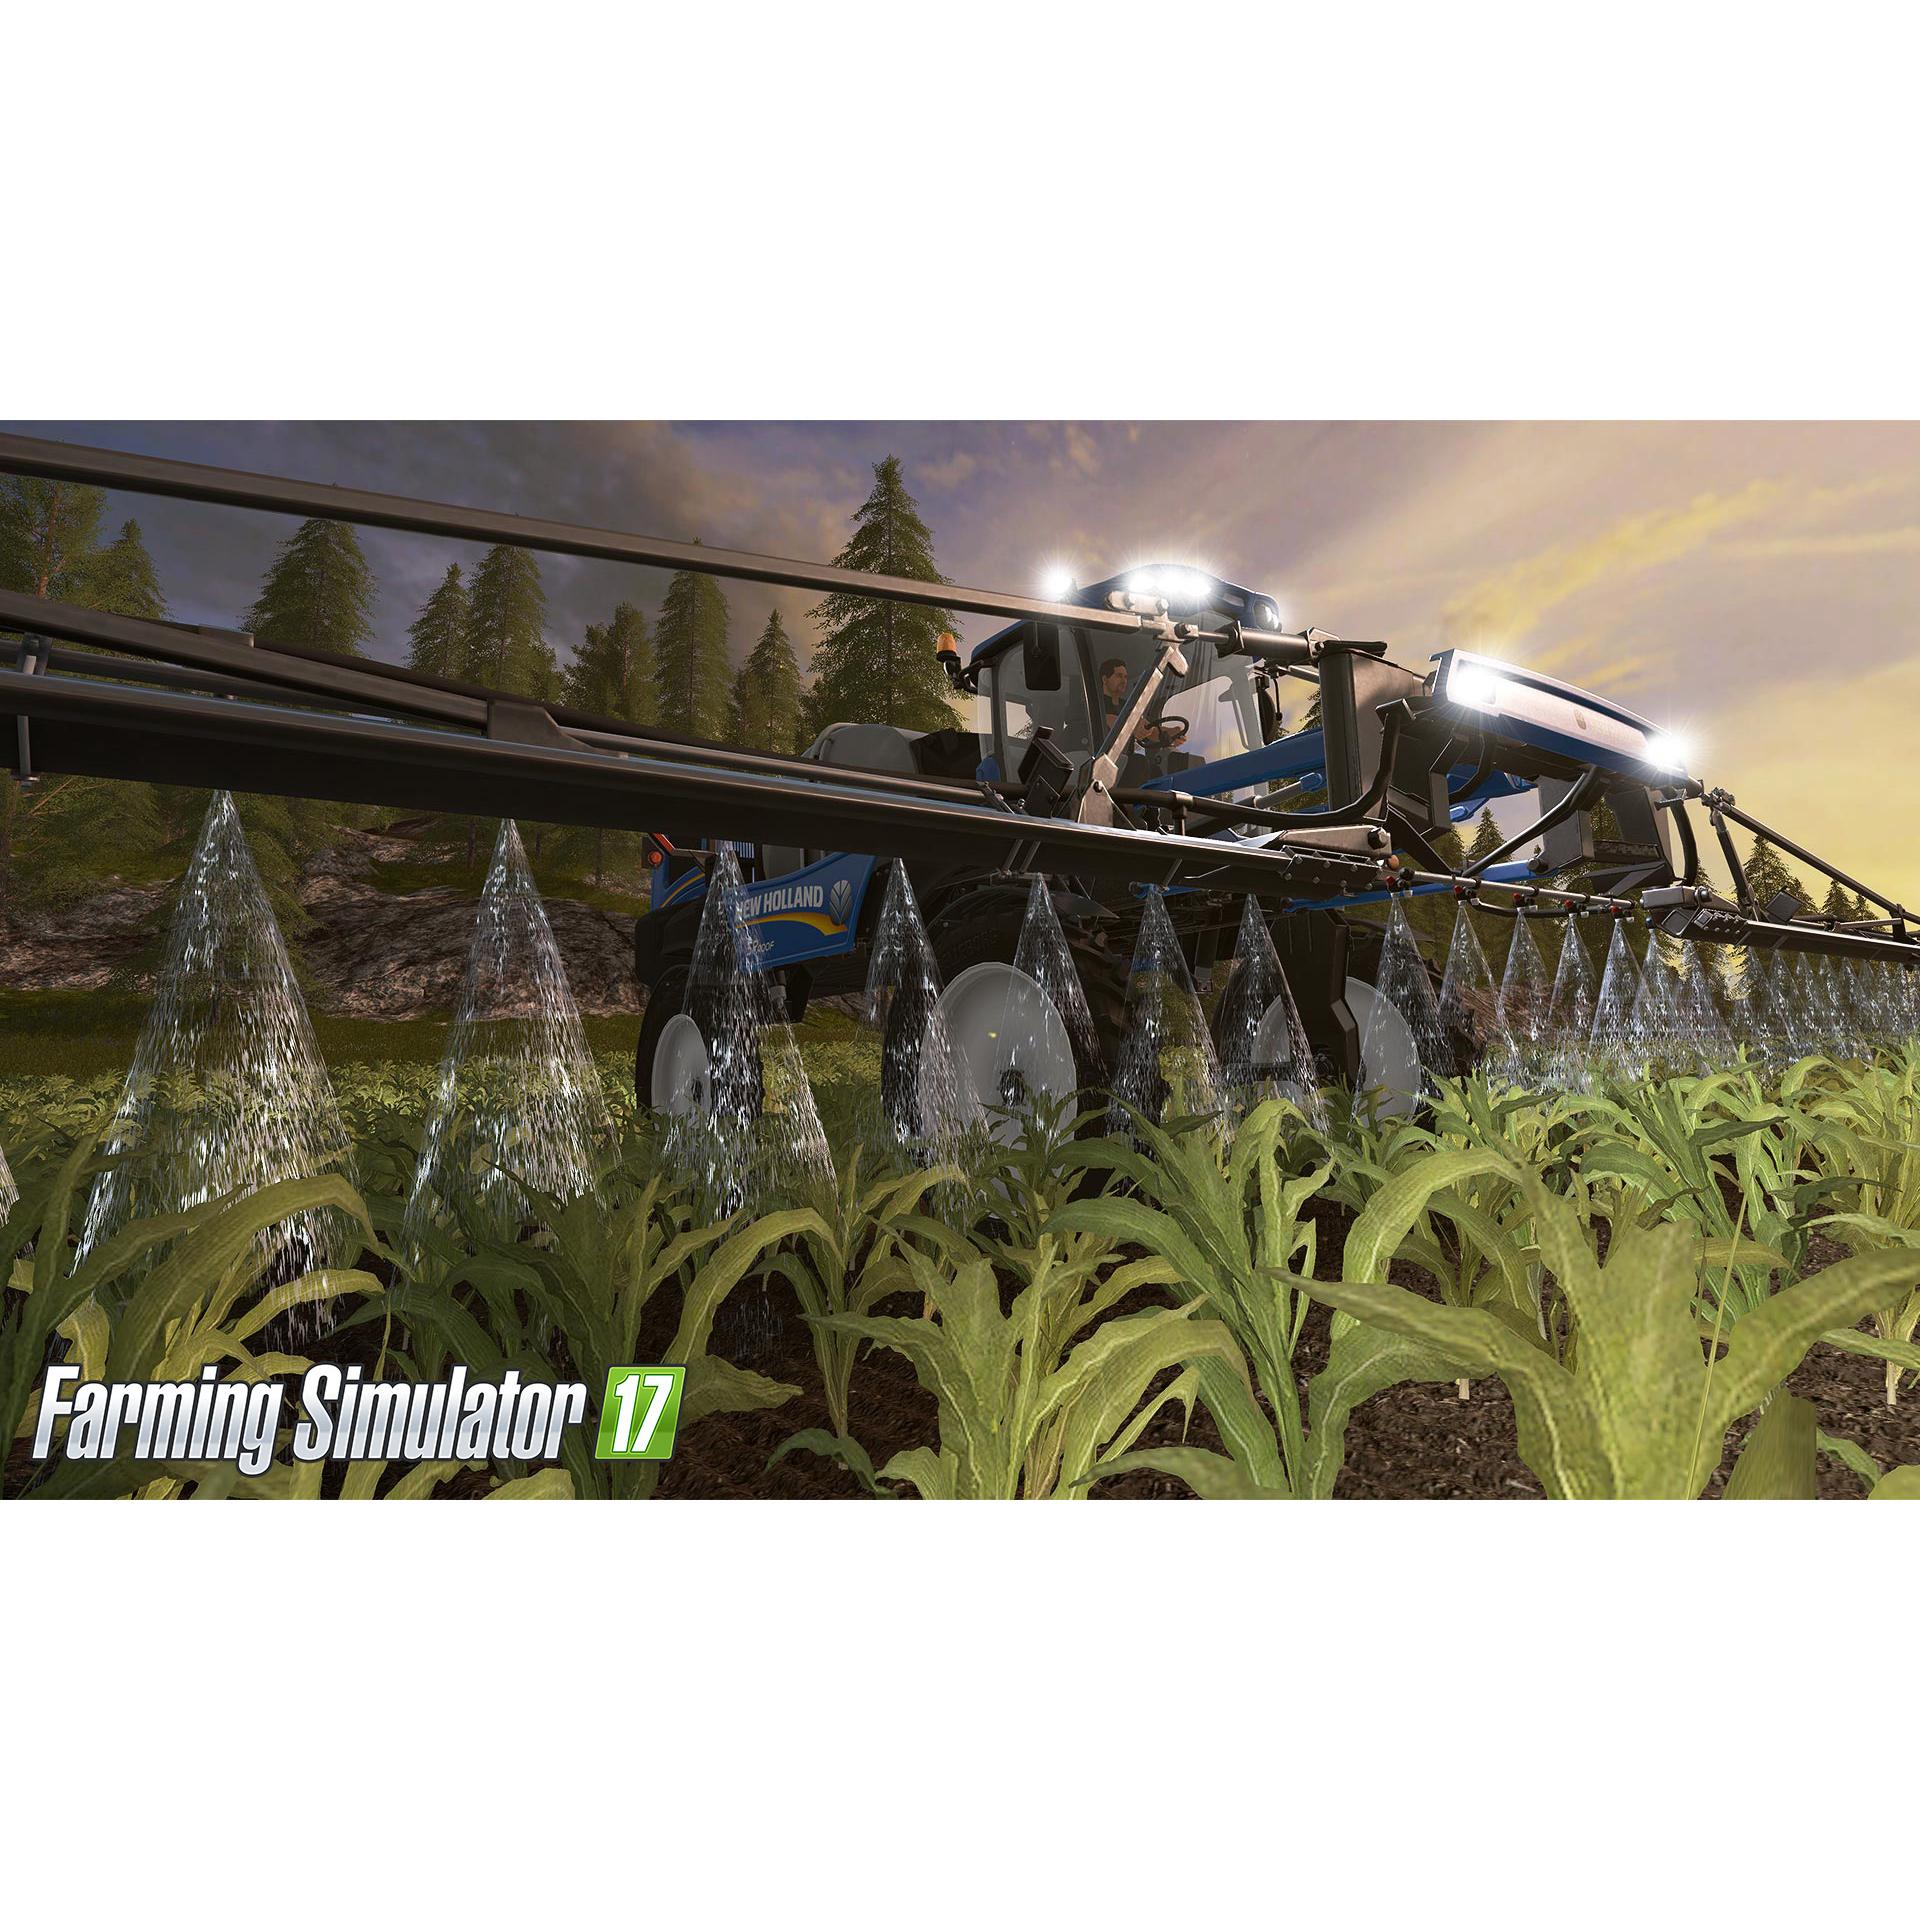 Farming simulator 17 Platinum edition, Xbox One 1